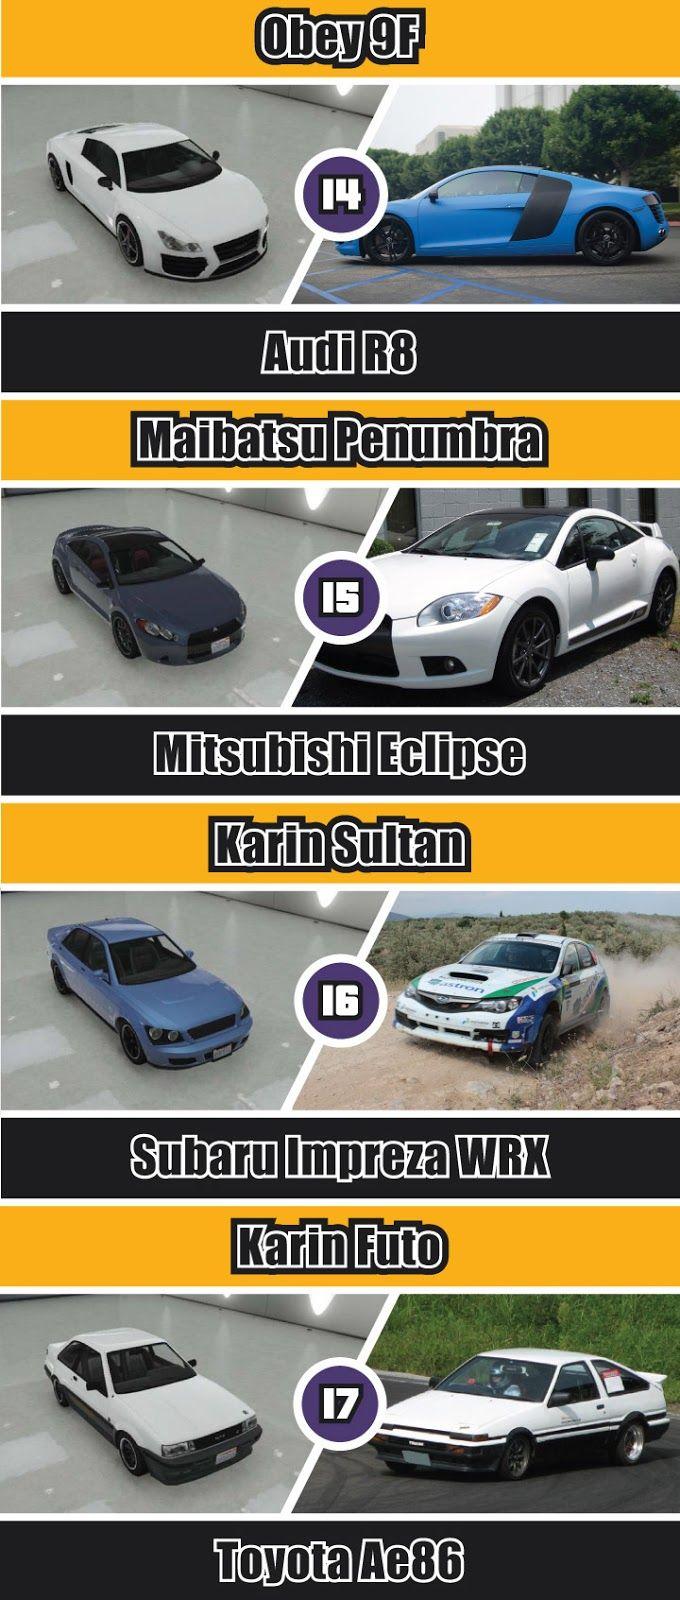 Best Gta Supercars Images On Pinterest Gta Grand Theft